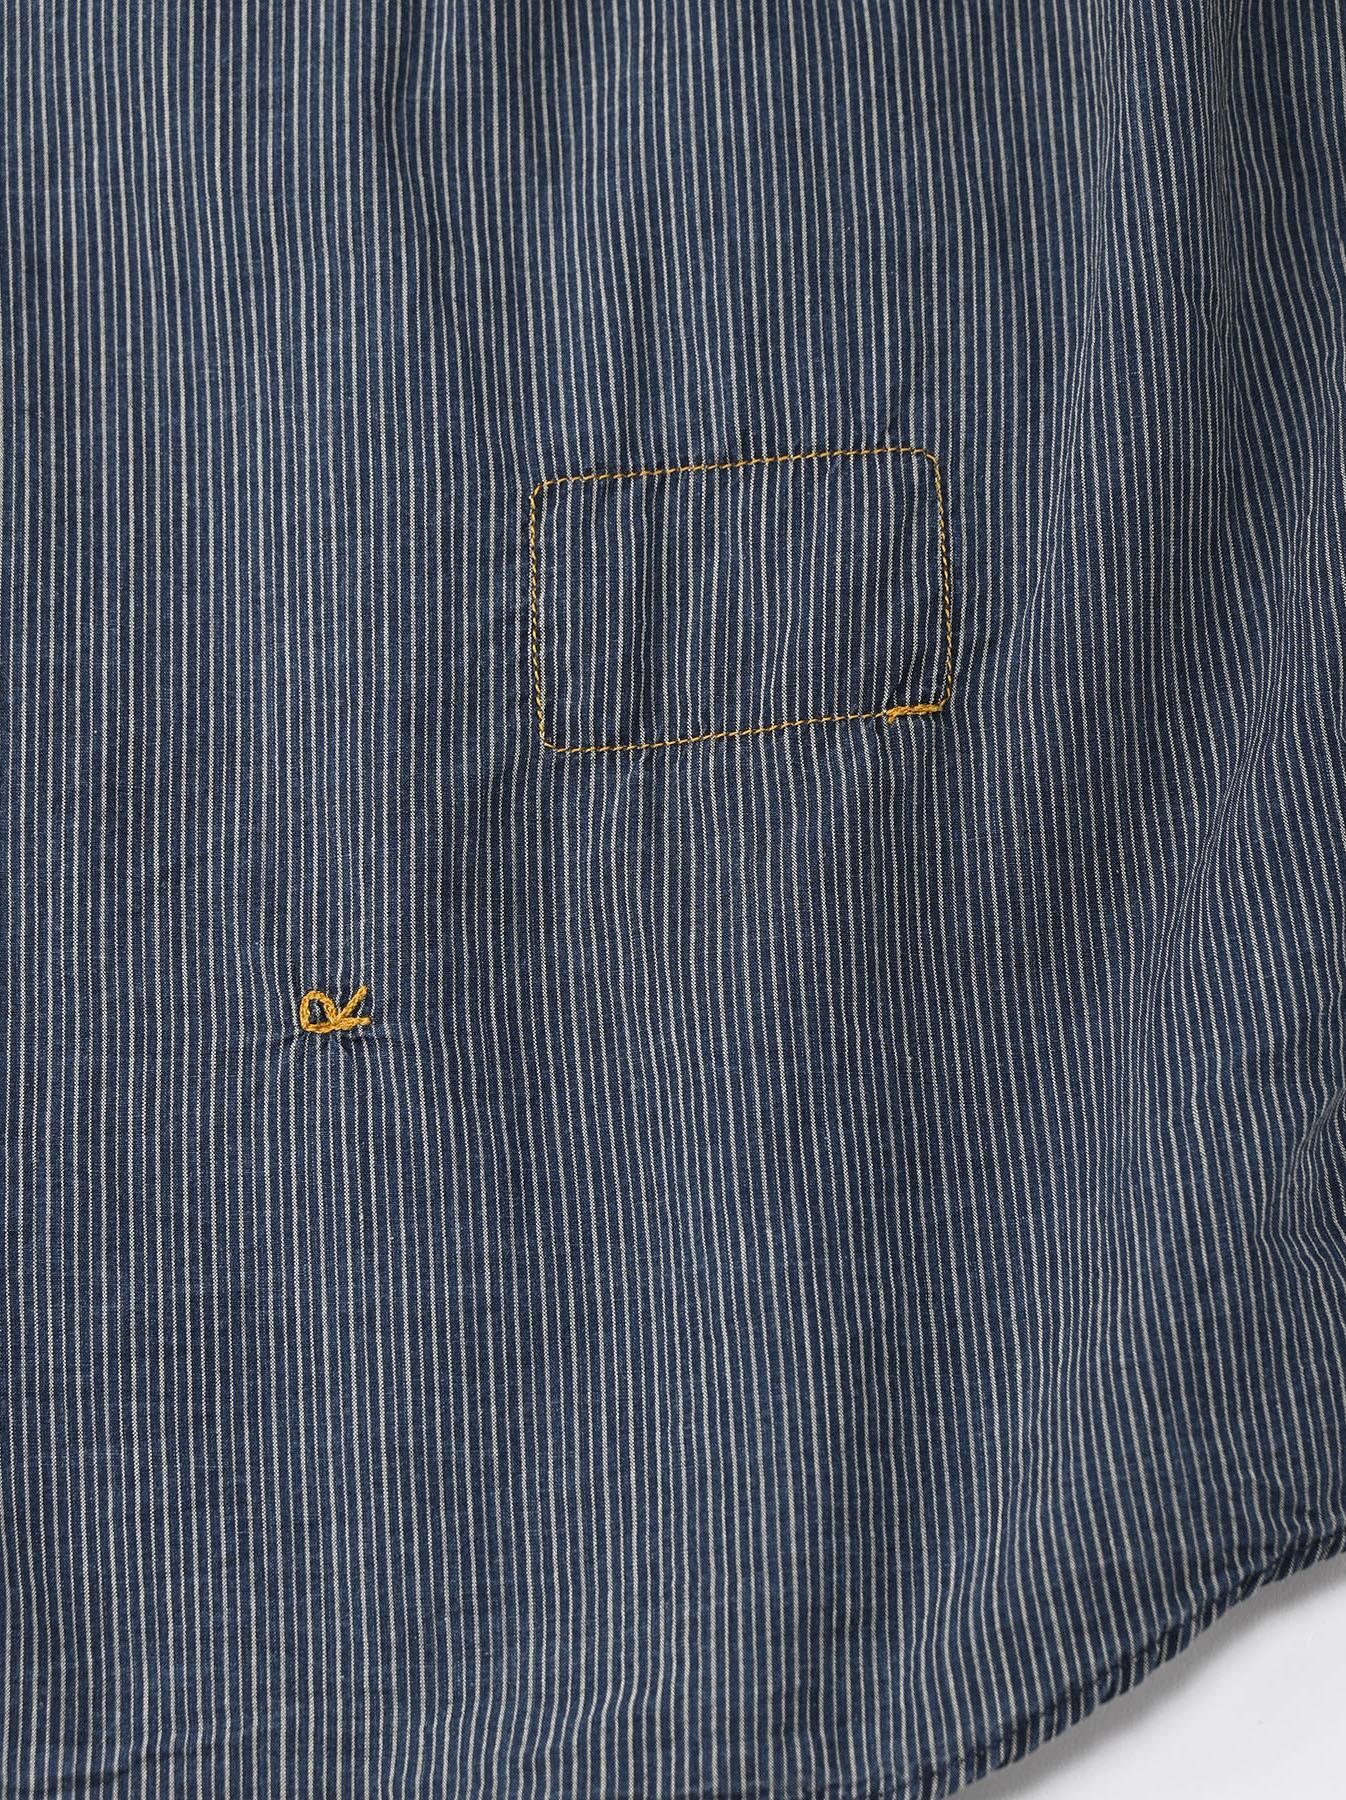 Indigo Hickory Tappet Ocean Stand Shirt-11